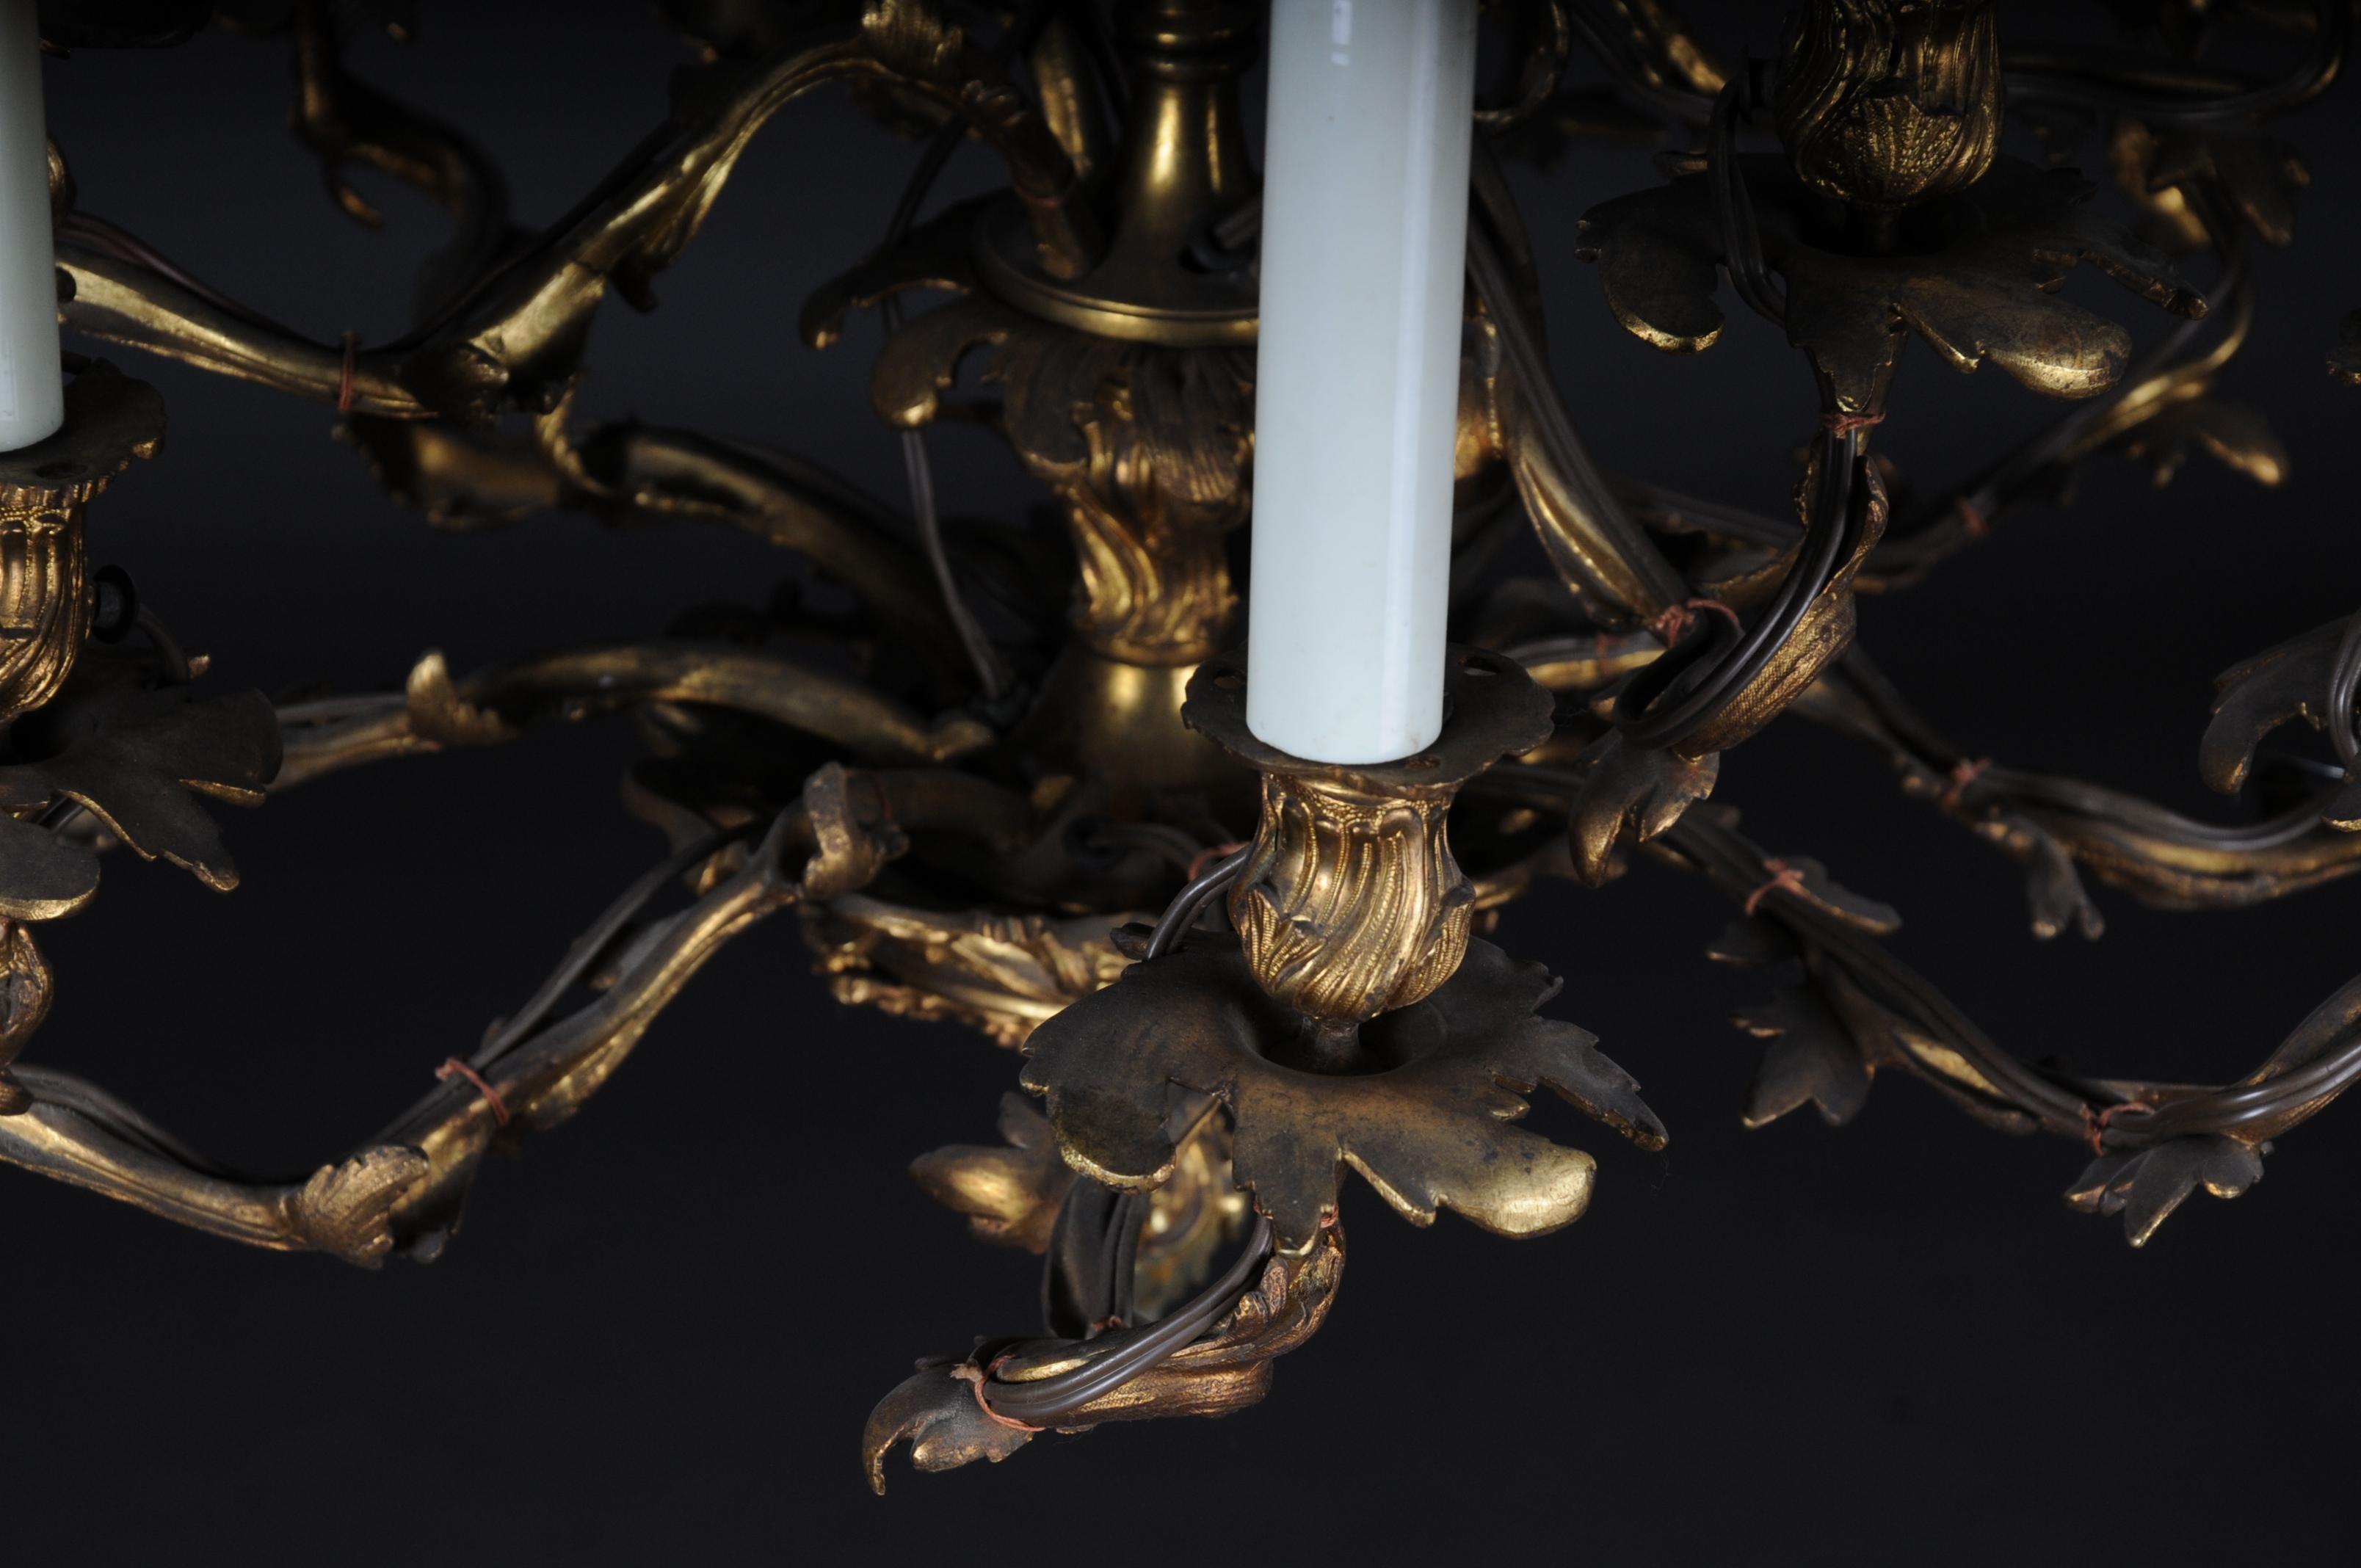 Kronleuchter Franske ~ Kronleuchter dresdner porzellan hampel kunstauktionen porzellan